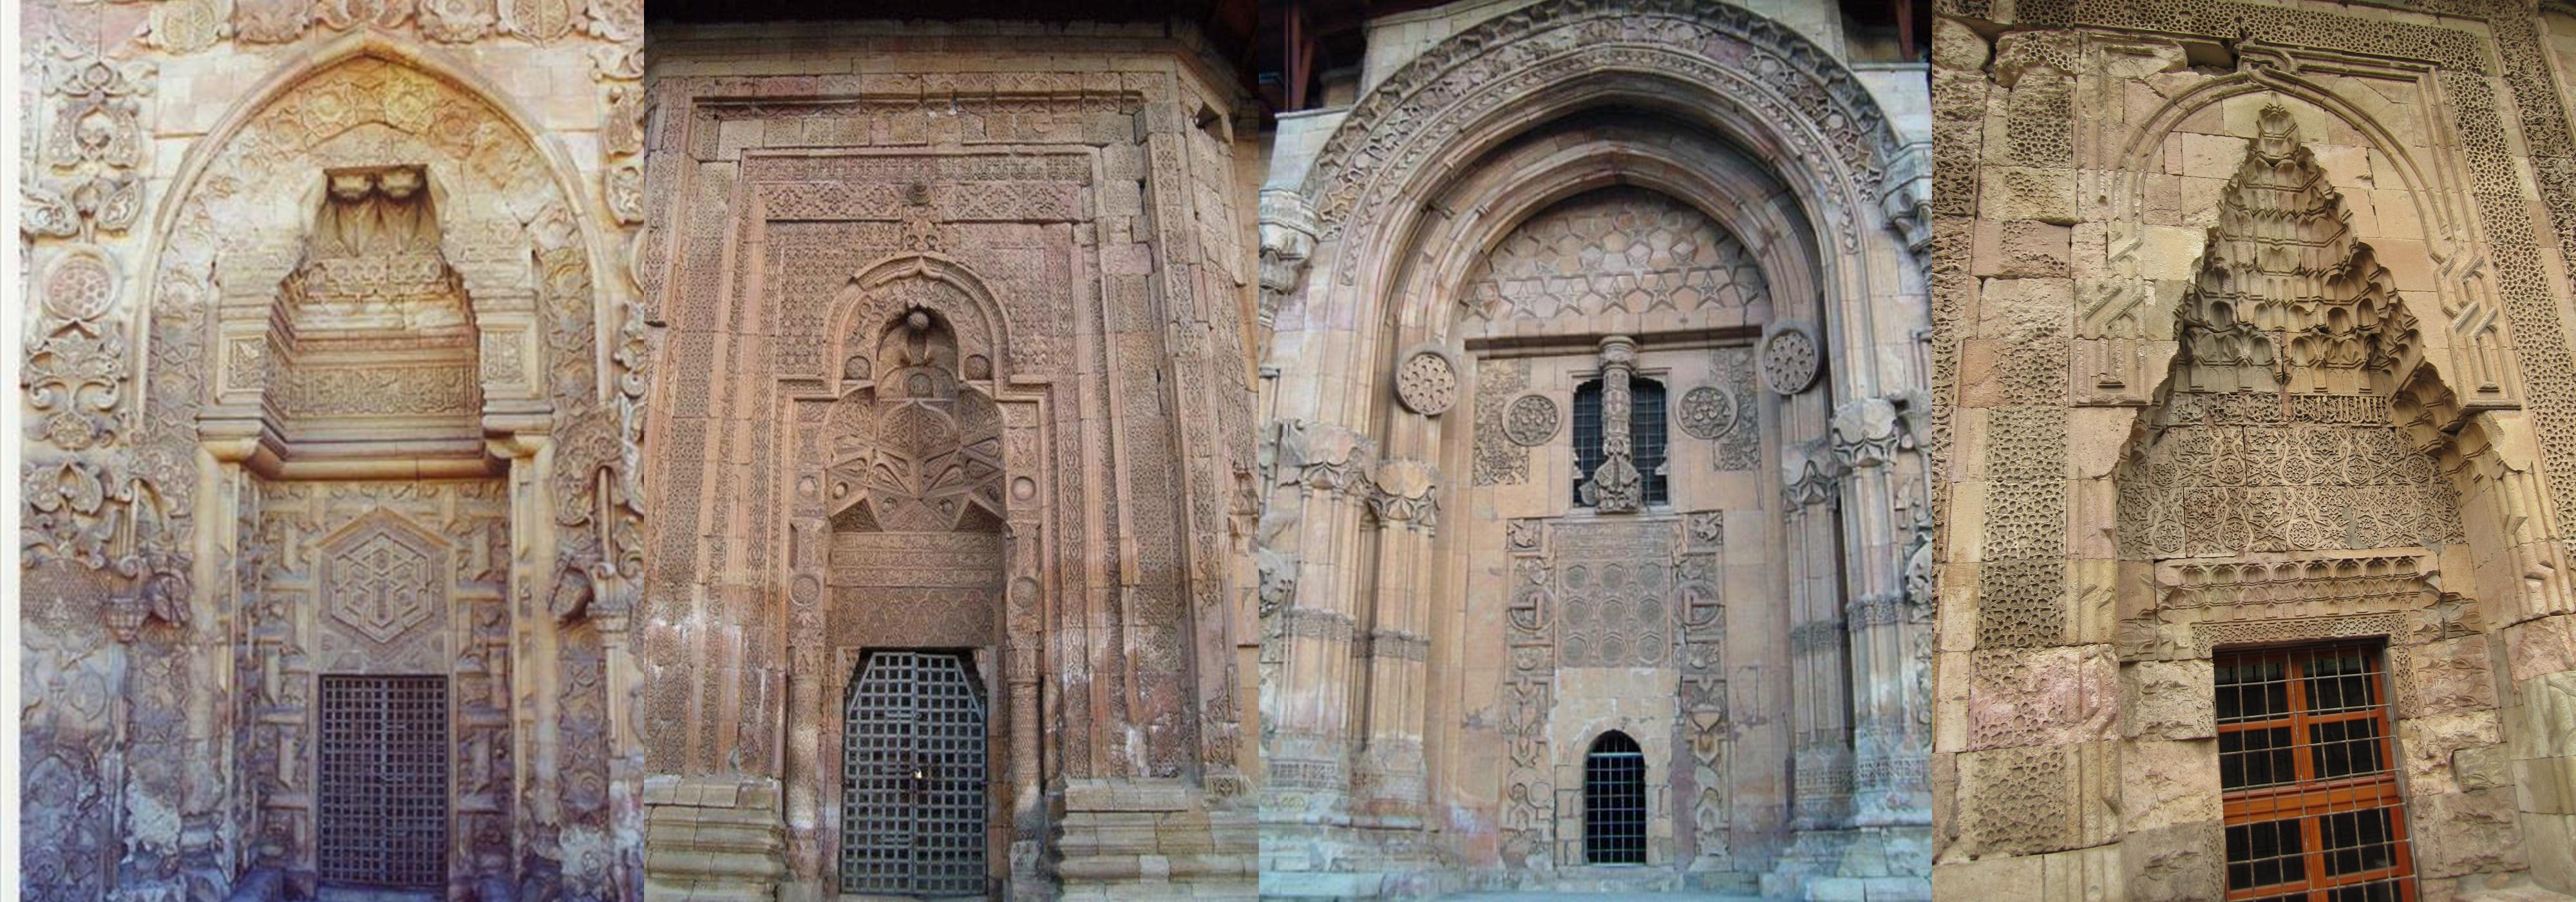 divrigi ulu camii kapılar